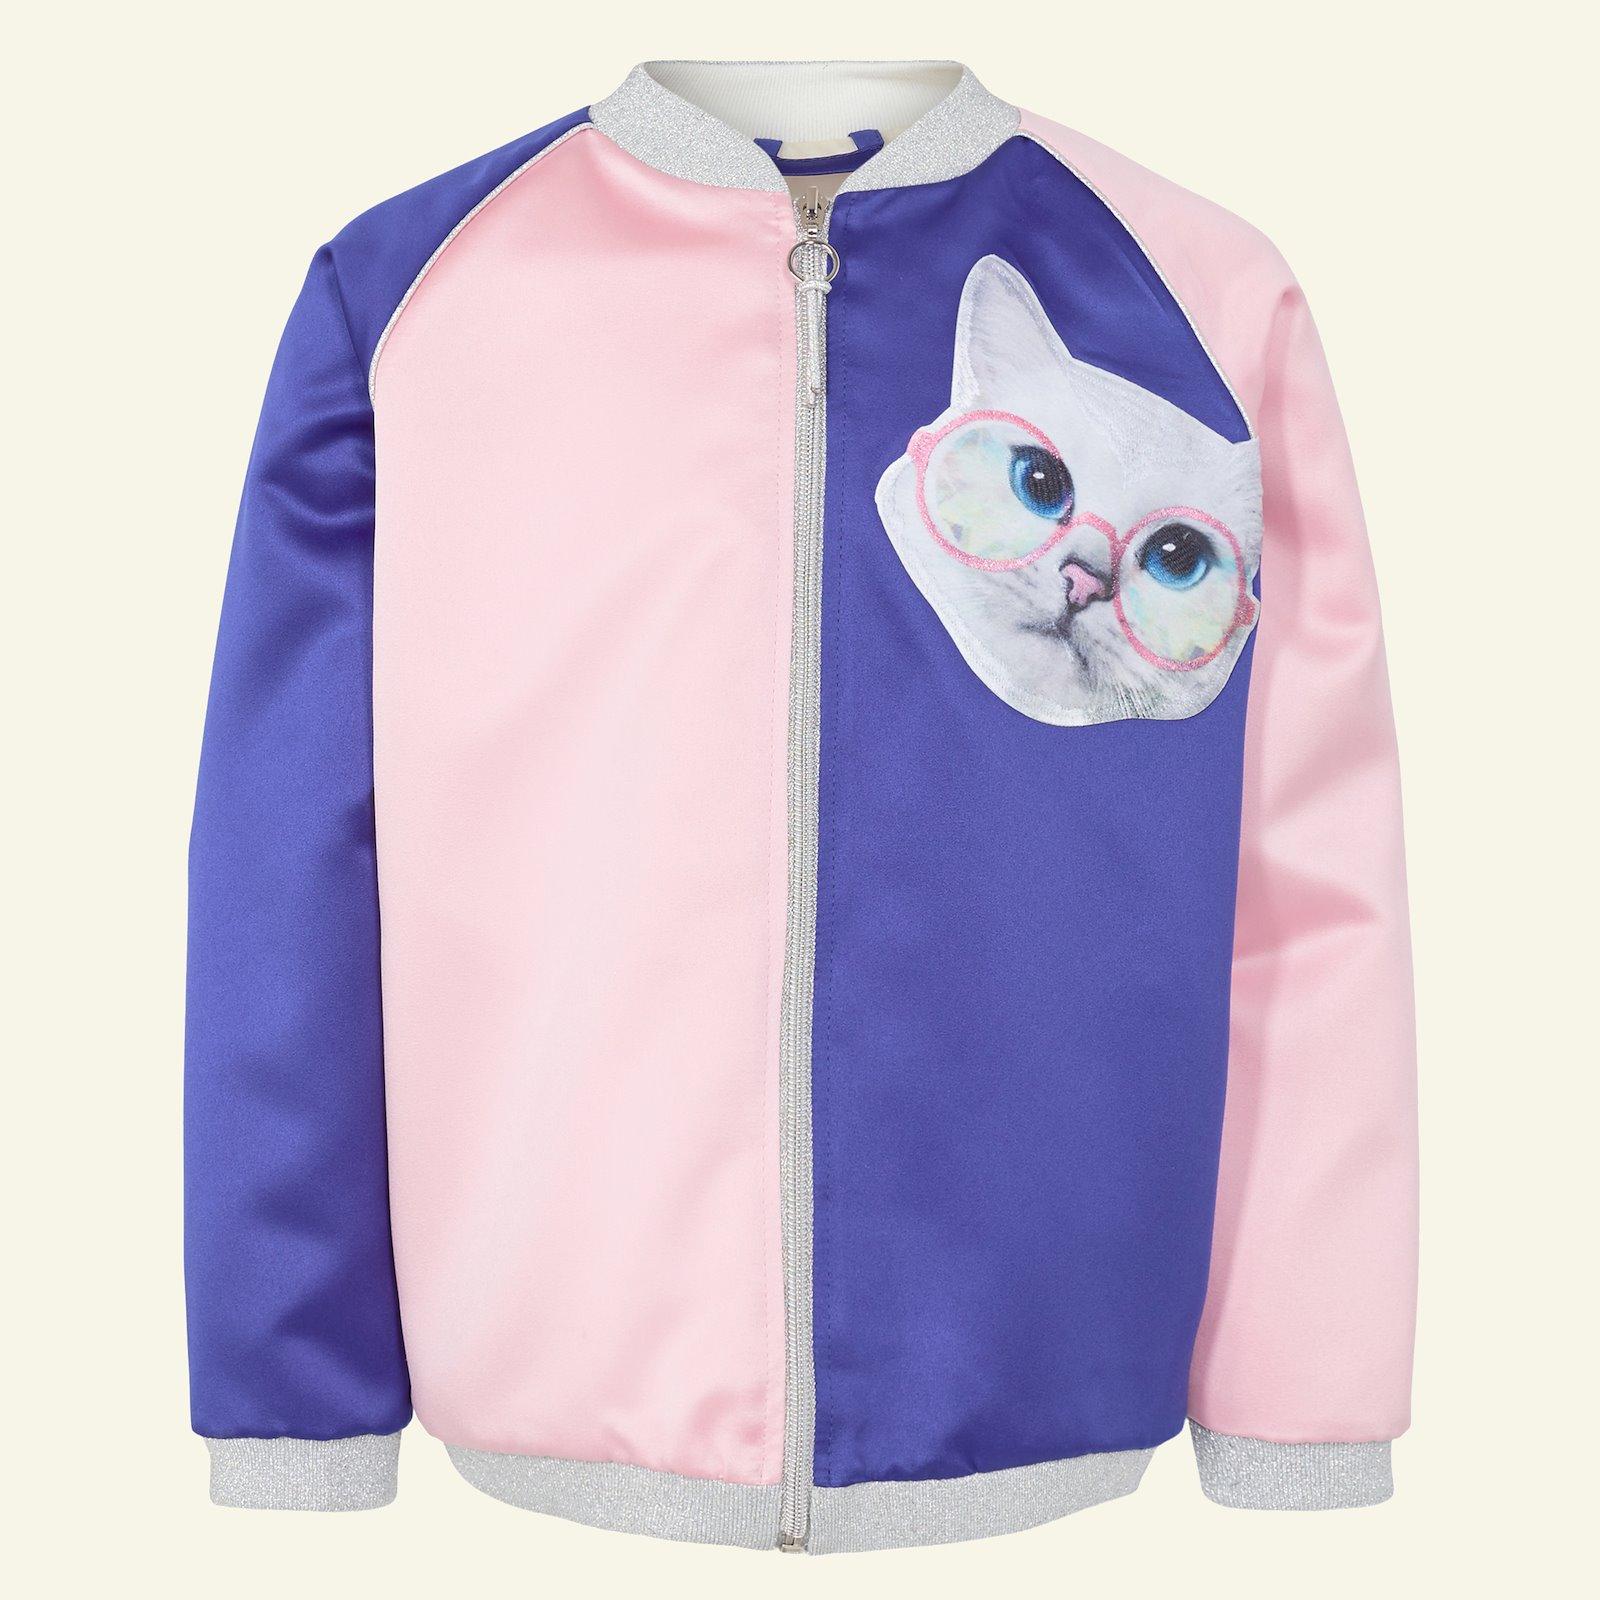 Bomber jacket, 164/14y p64017_620417_620094_96111_72078_26436_sskit